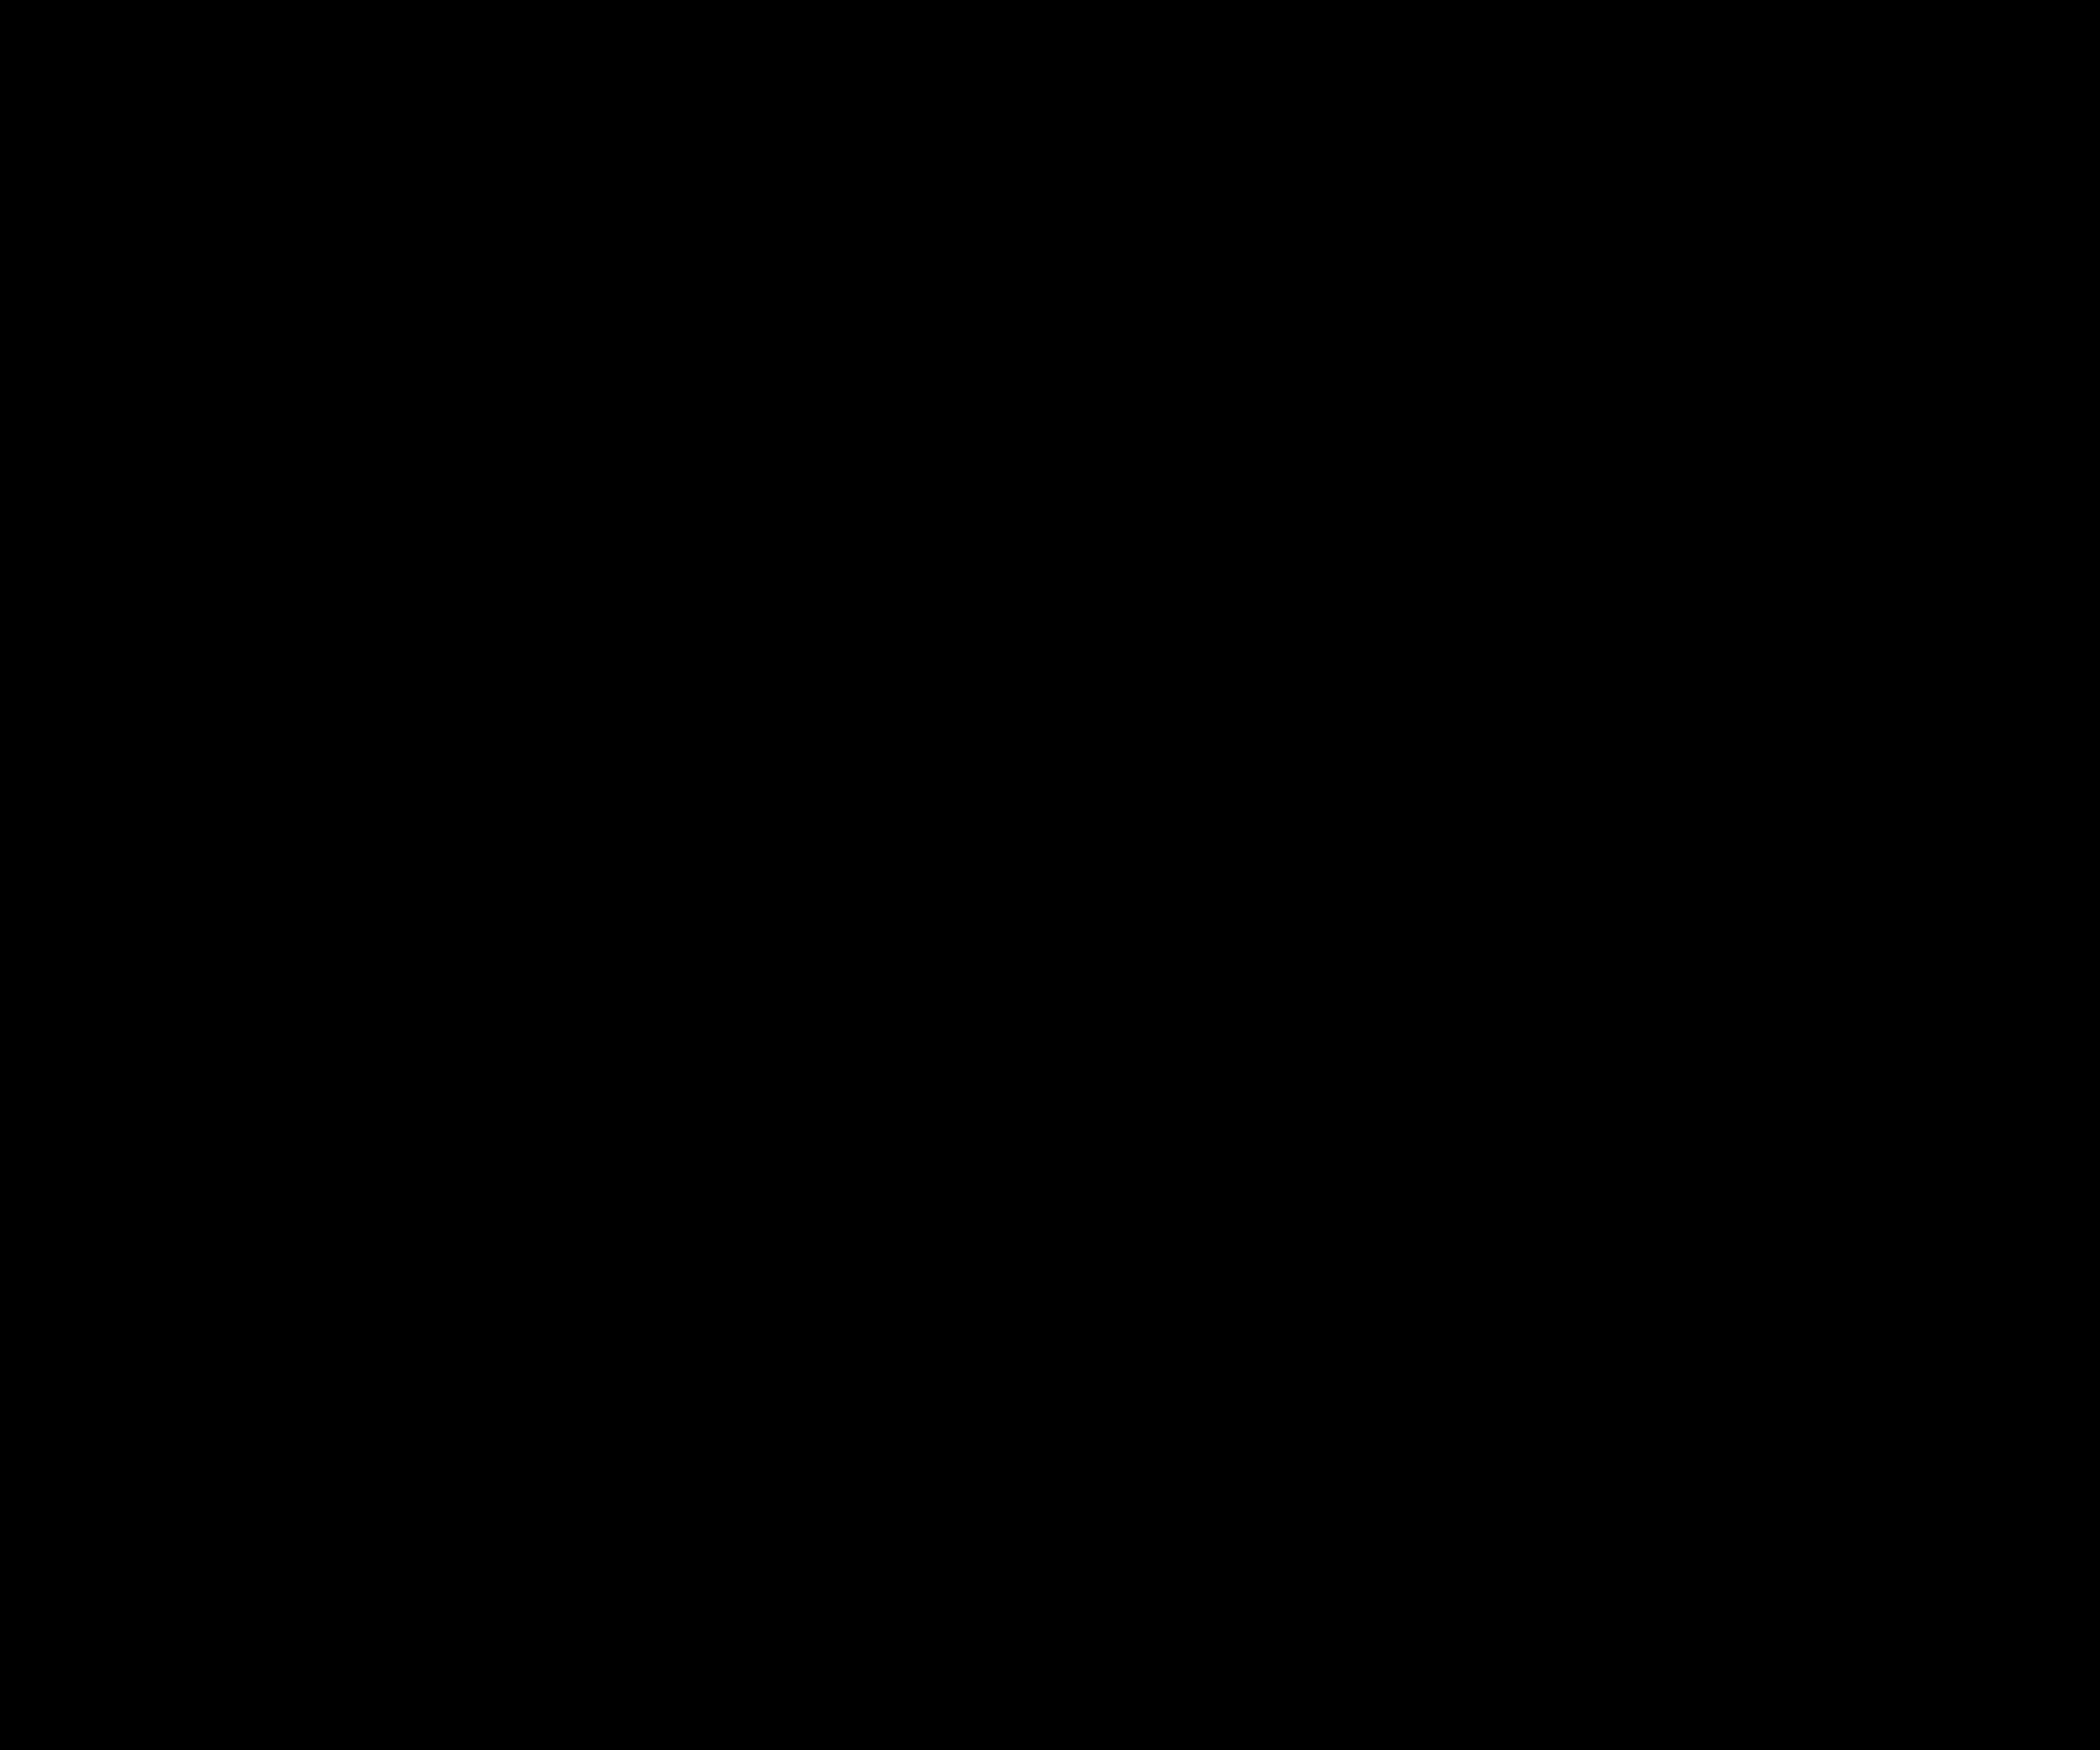 Наушники PNG фото